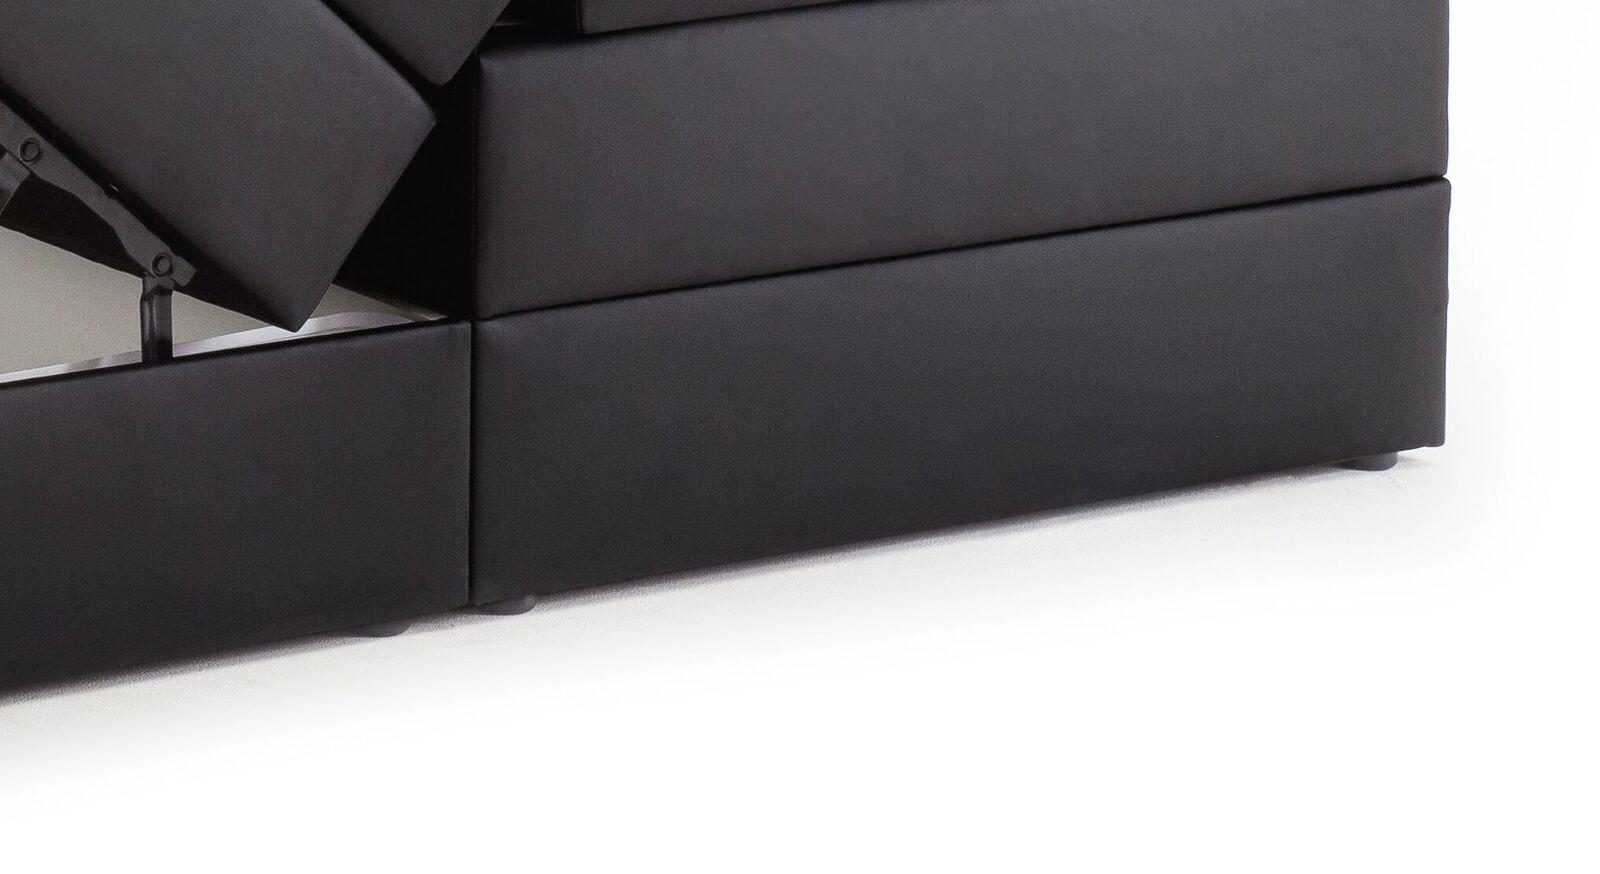 Bettkasten-Boxspringbett Tollocan mit niedrigen Kunststoffgleitern